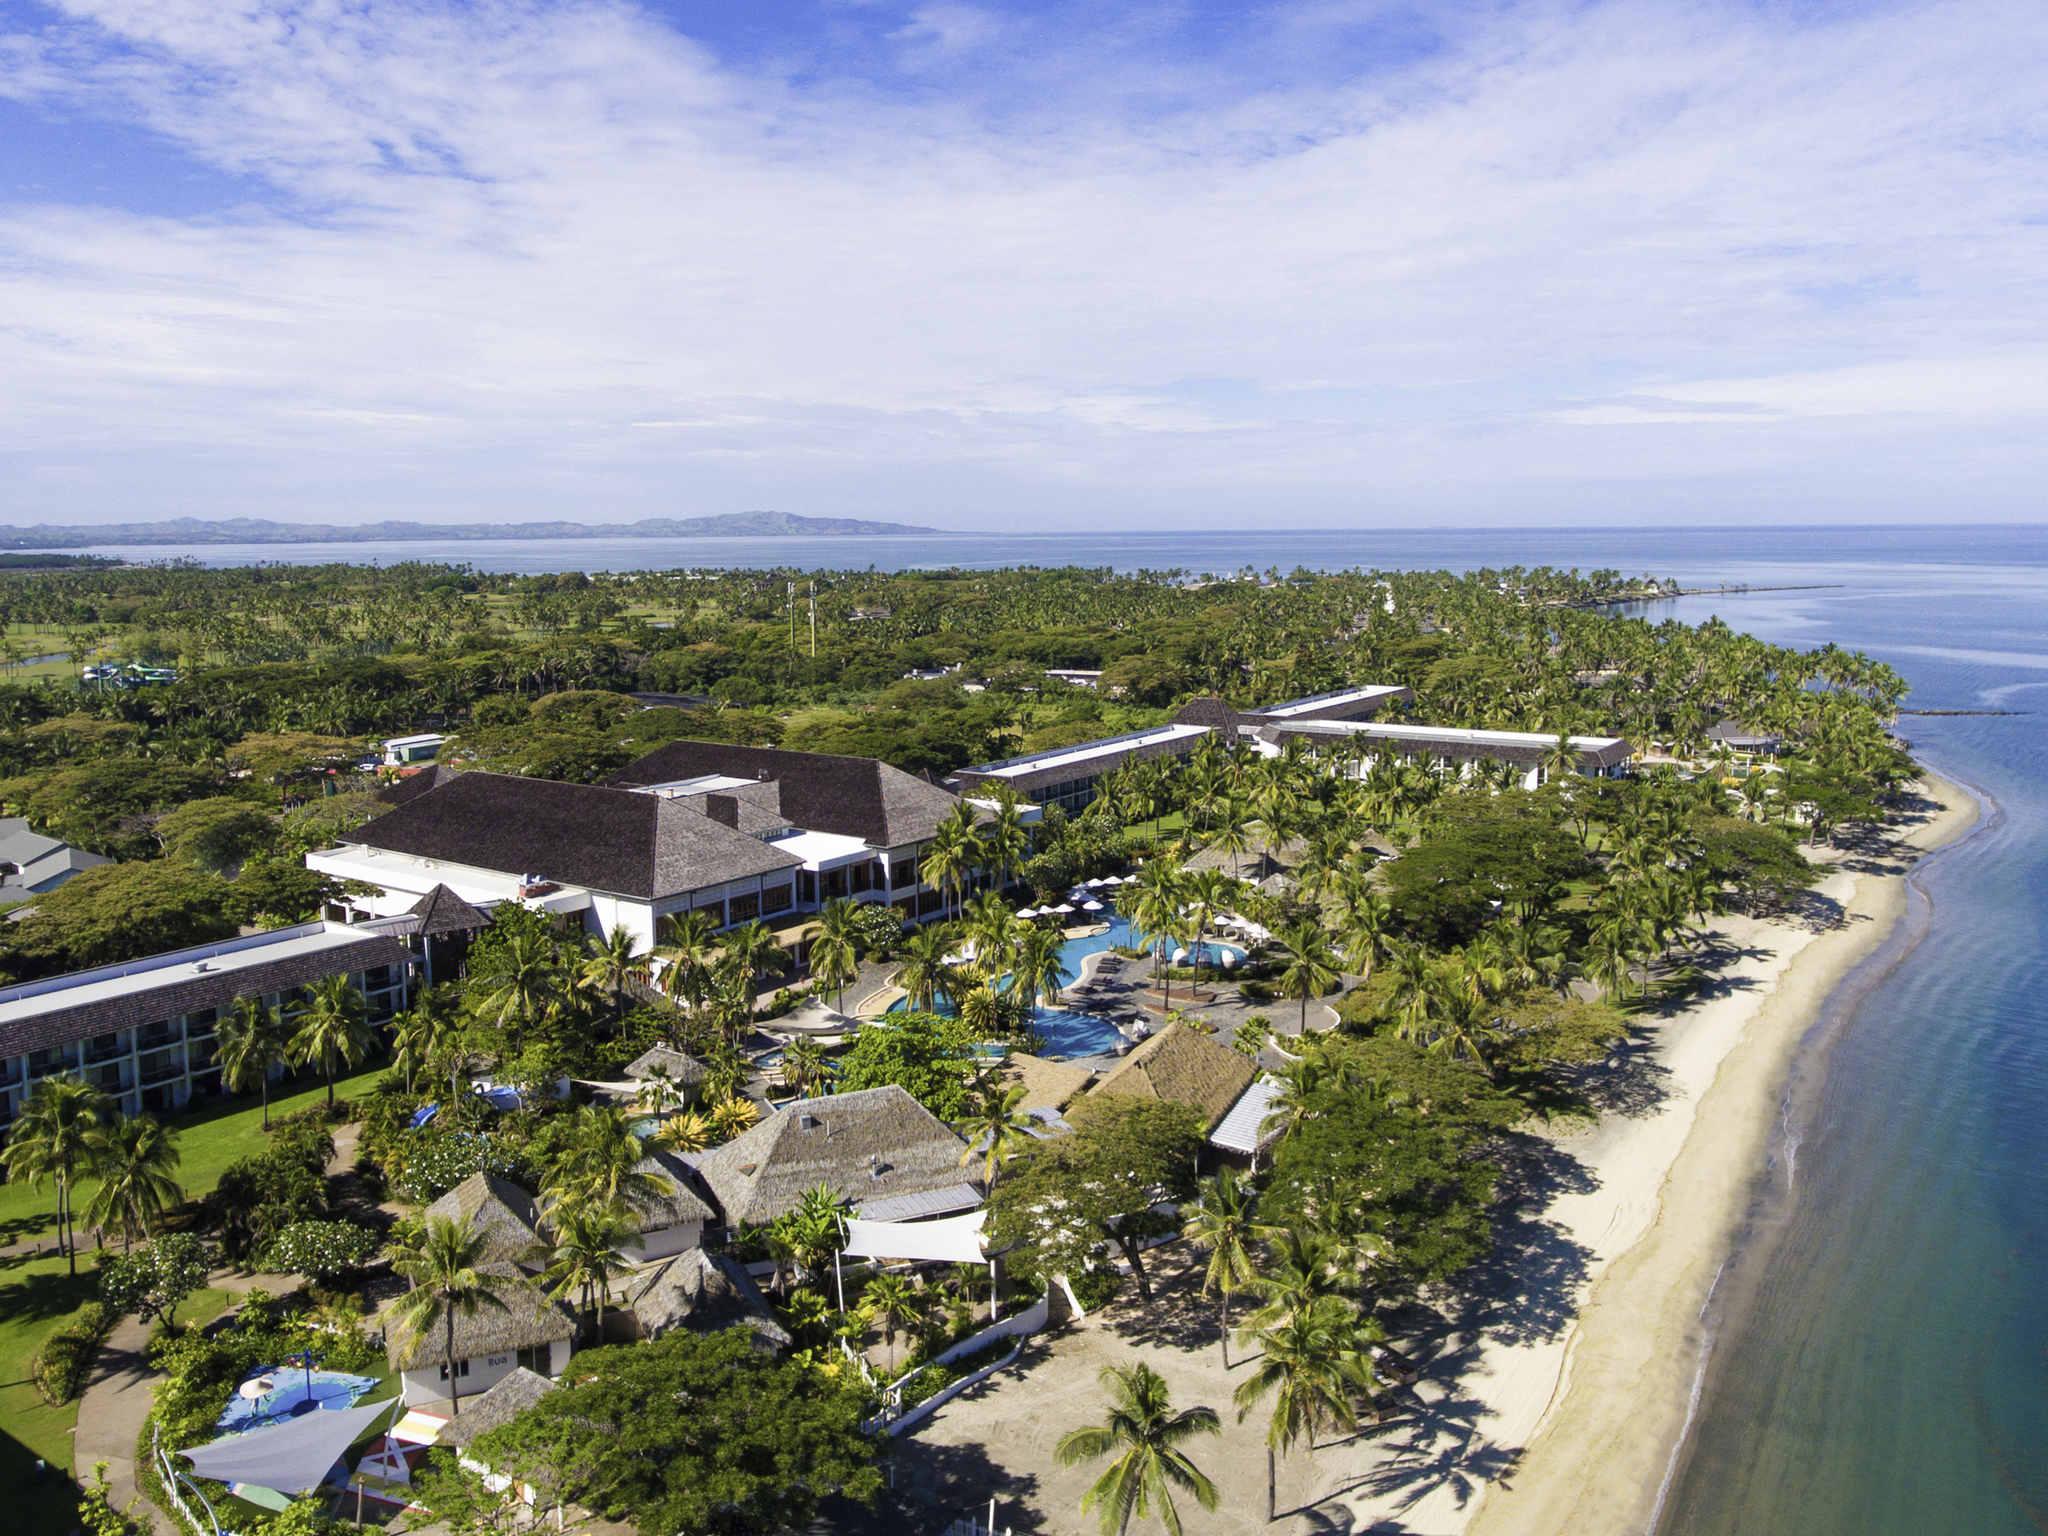 Sofitel Fiji Resort and Spa-Luxury Hotel on Denarau Island